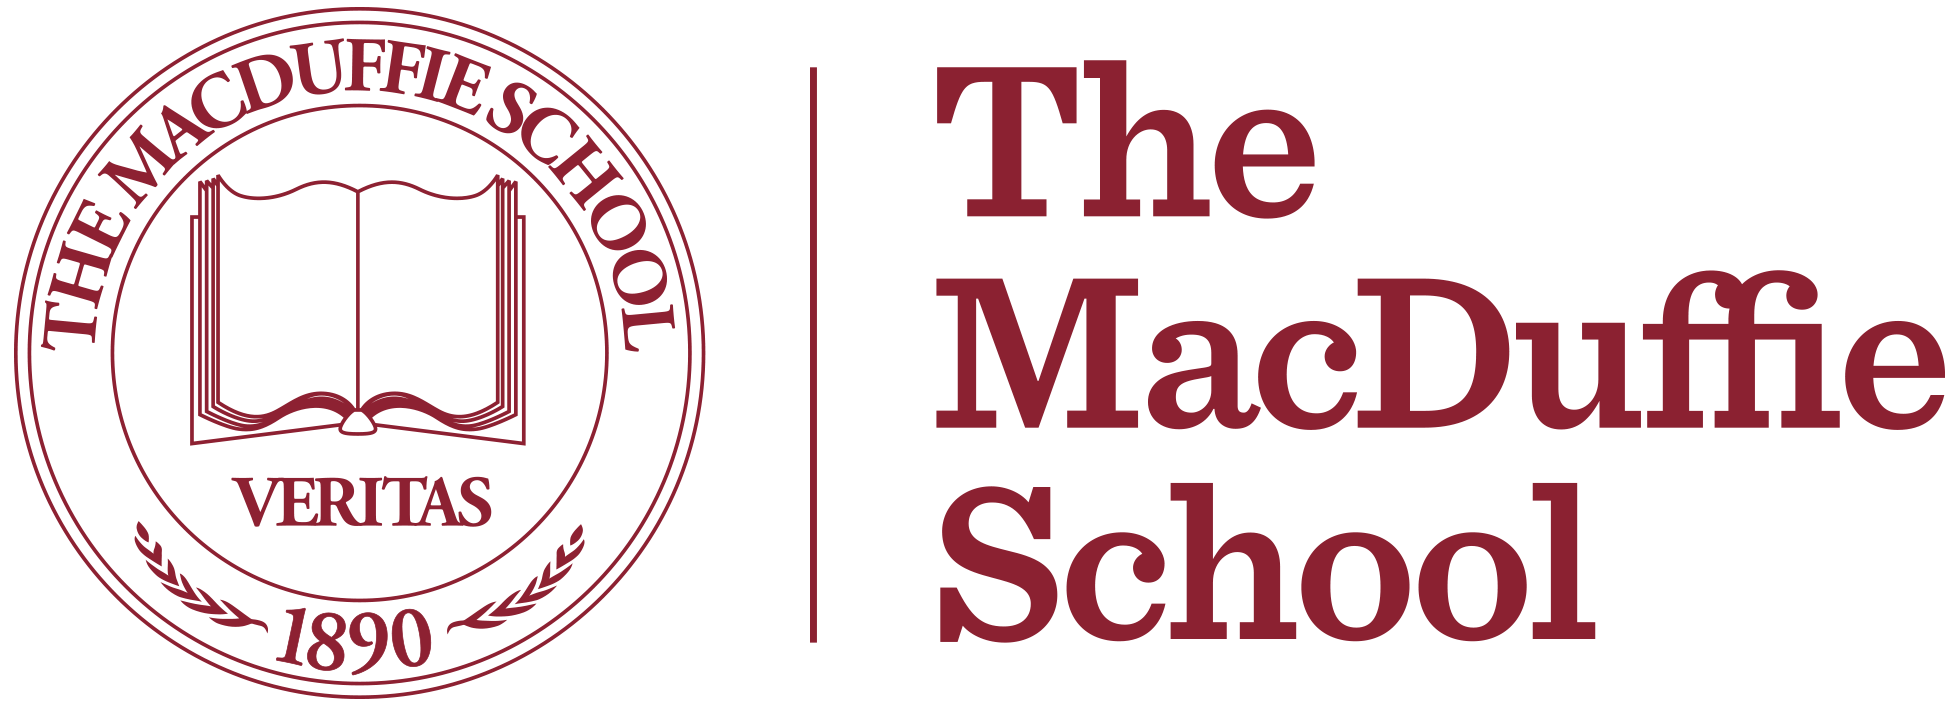 Massachusetts - Trường Trung Học The MacDuffie School - USA